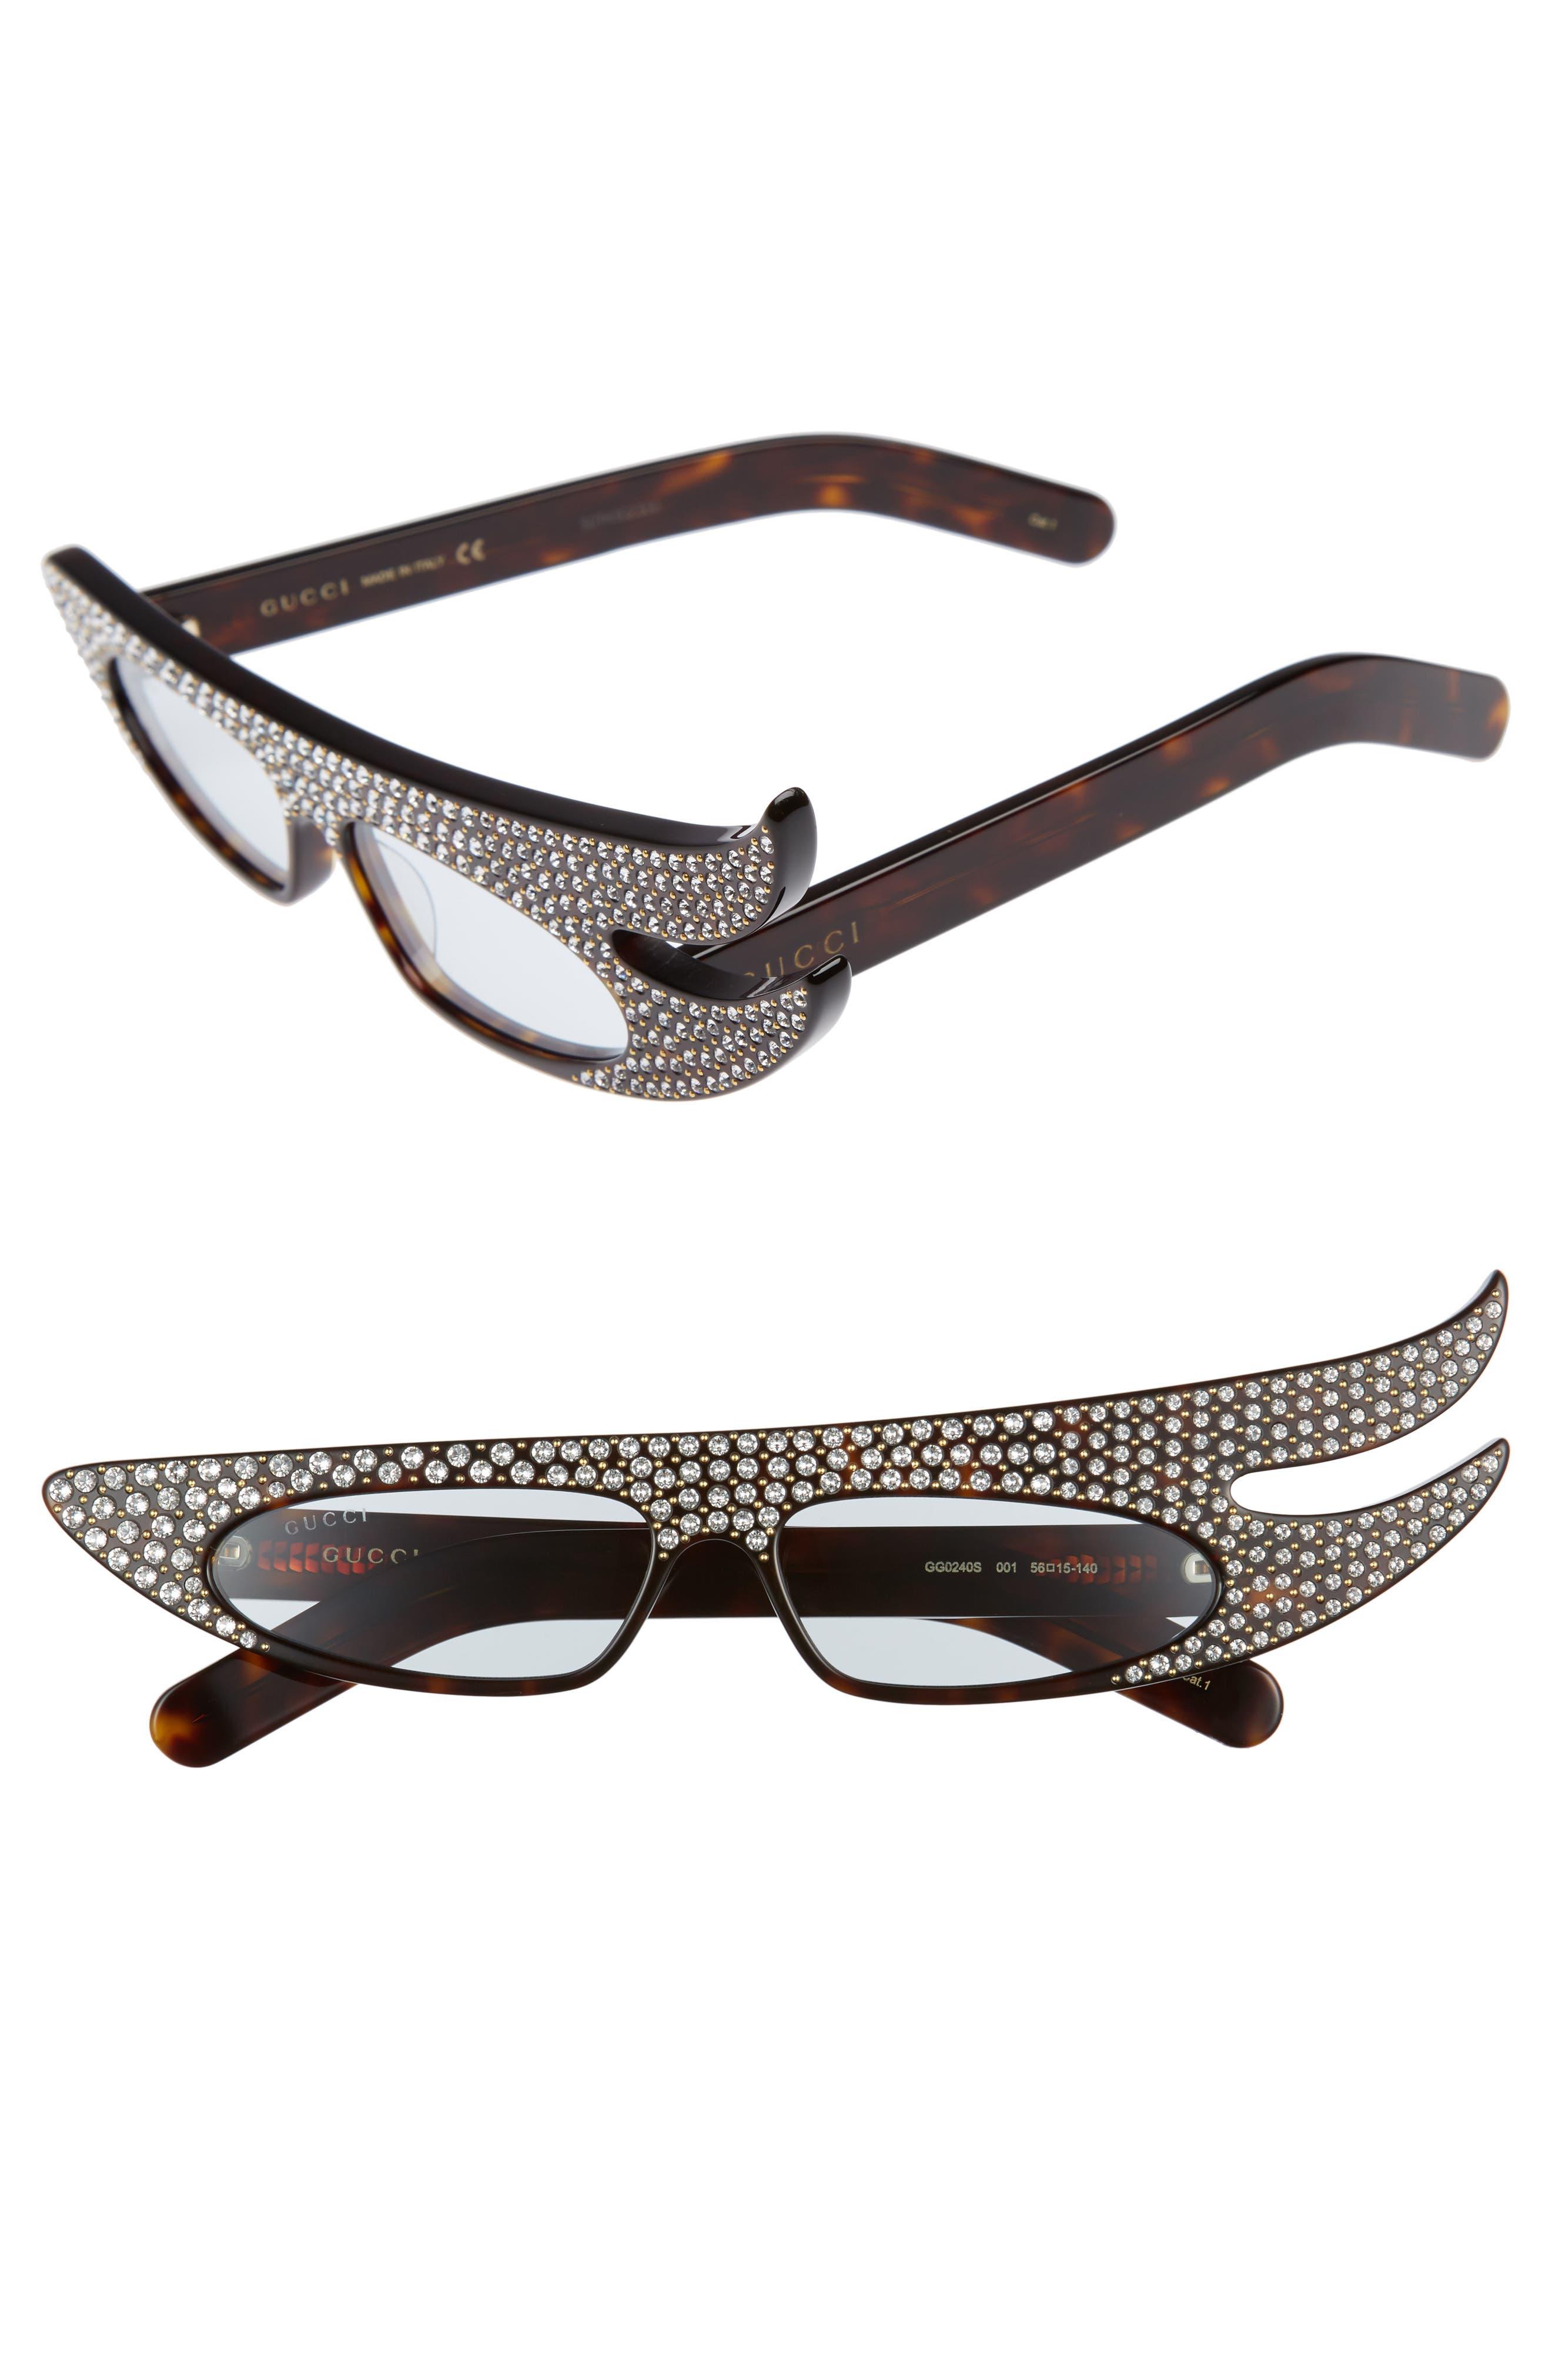 56mm Embellished Statement Sunglasses,                             Main thumbnail 1, color,                             HAVANA